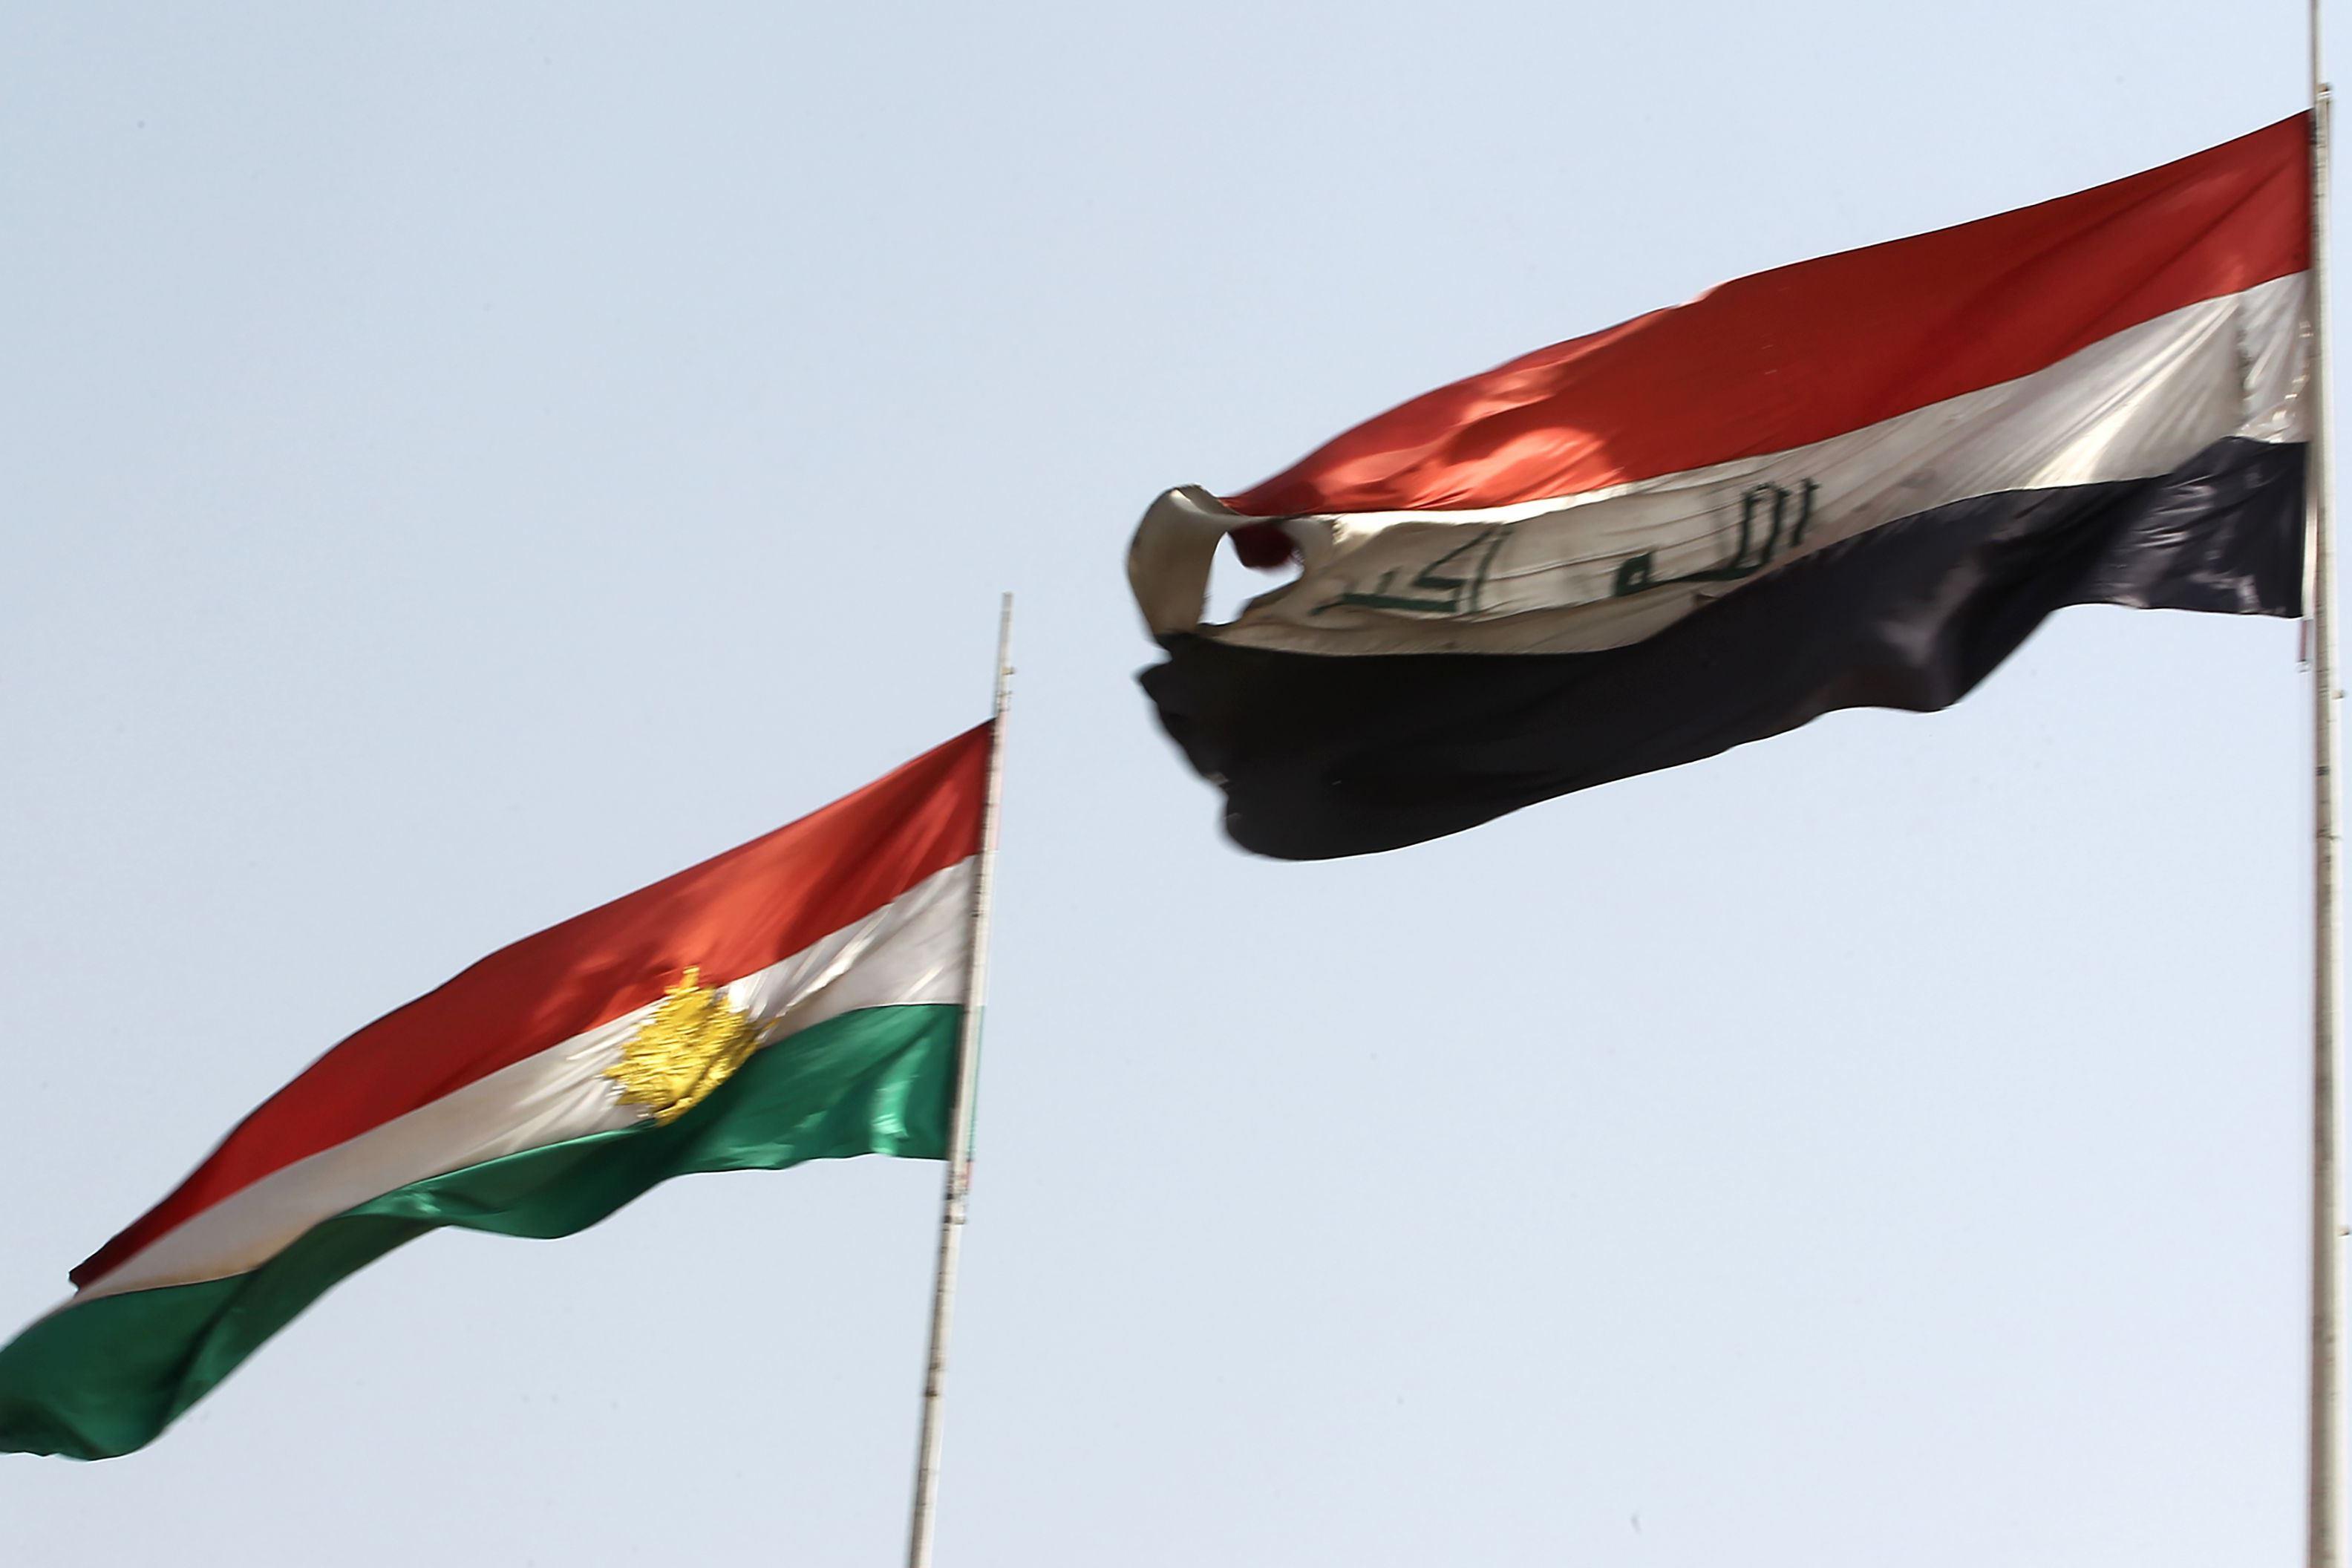 Kurdish referendum: Iran closes border with Iraqi Kurdistan over independence vote fears